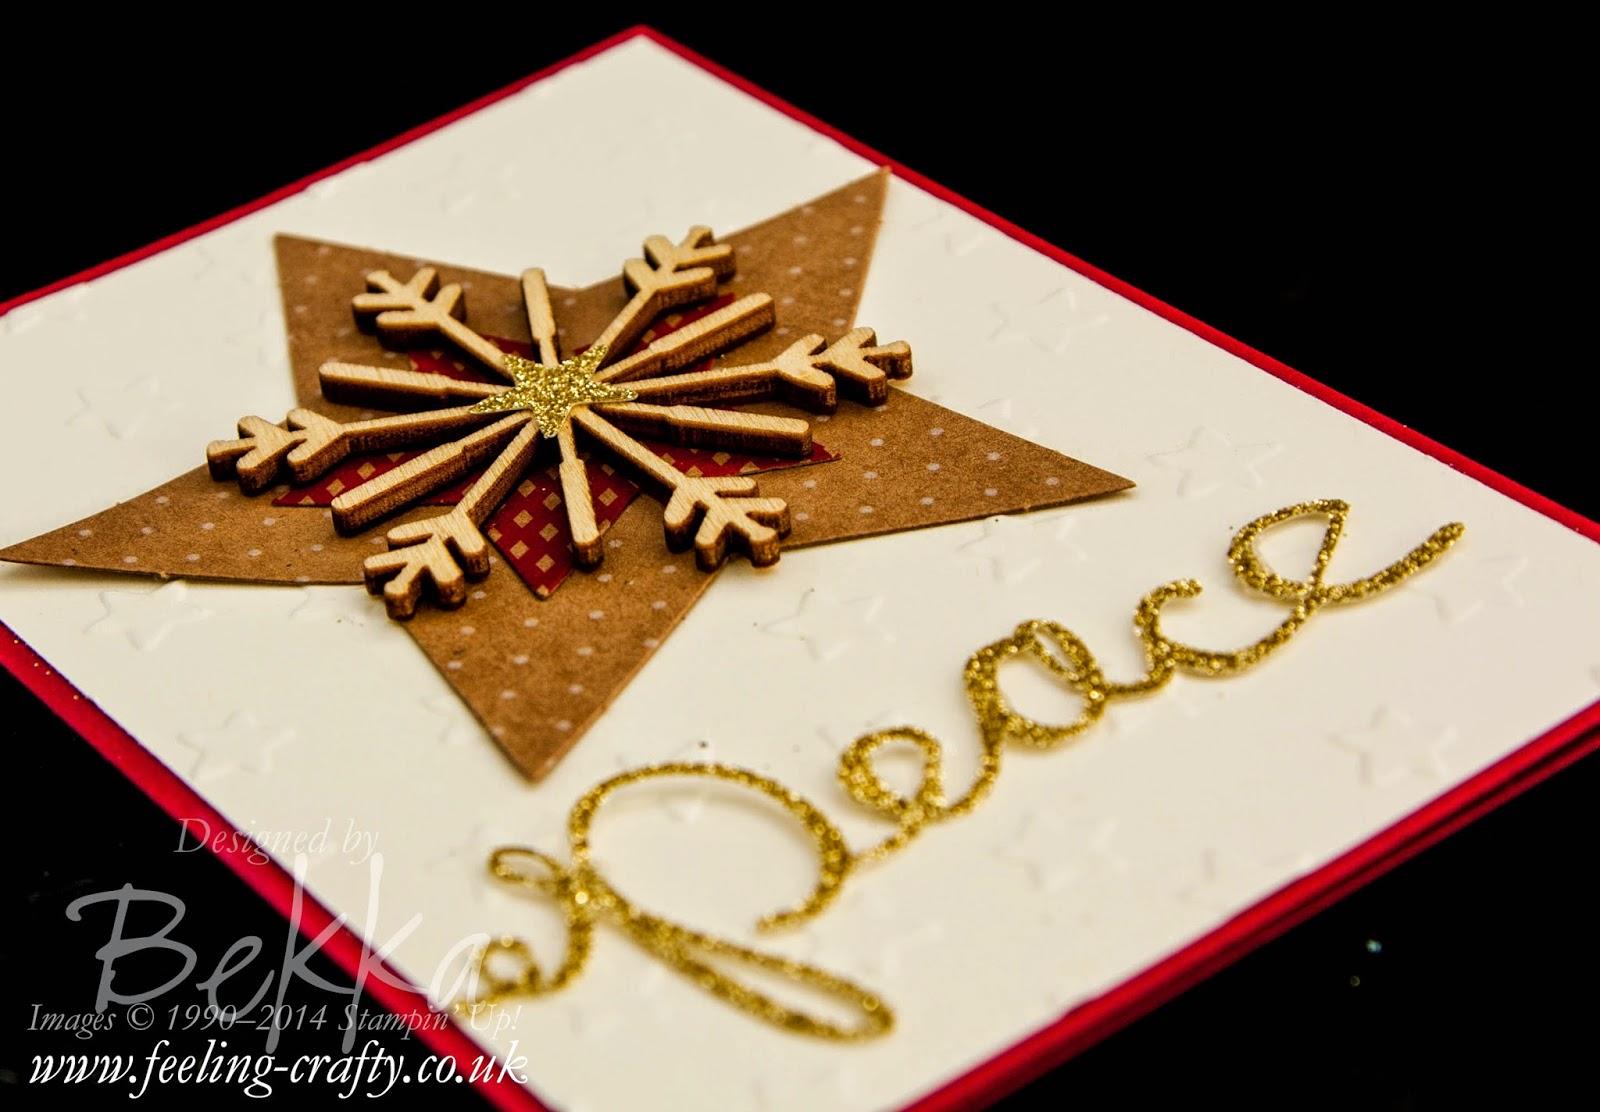 Many Merry Stars Simply Created Kit - A Card